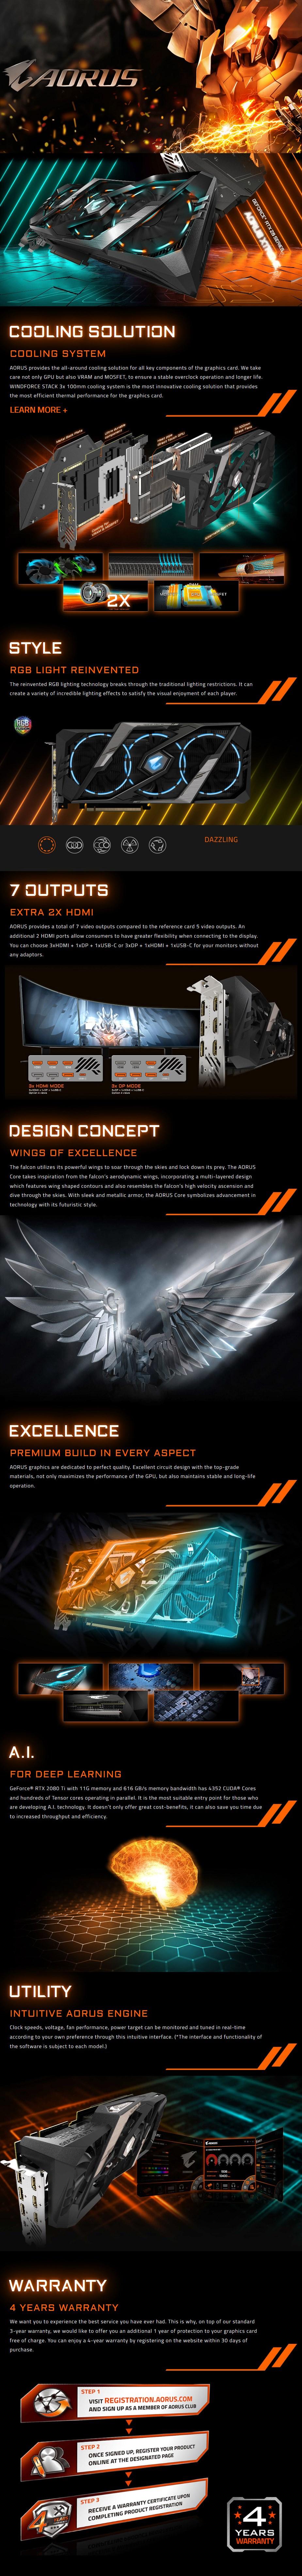 Gigabyte AORUS GeForce RTX 2080 Ti Xtreme 11GB Video Card - Desktop Overview 1